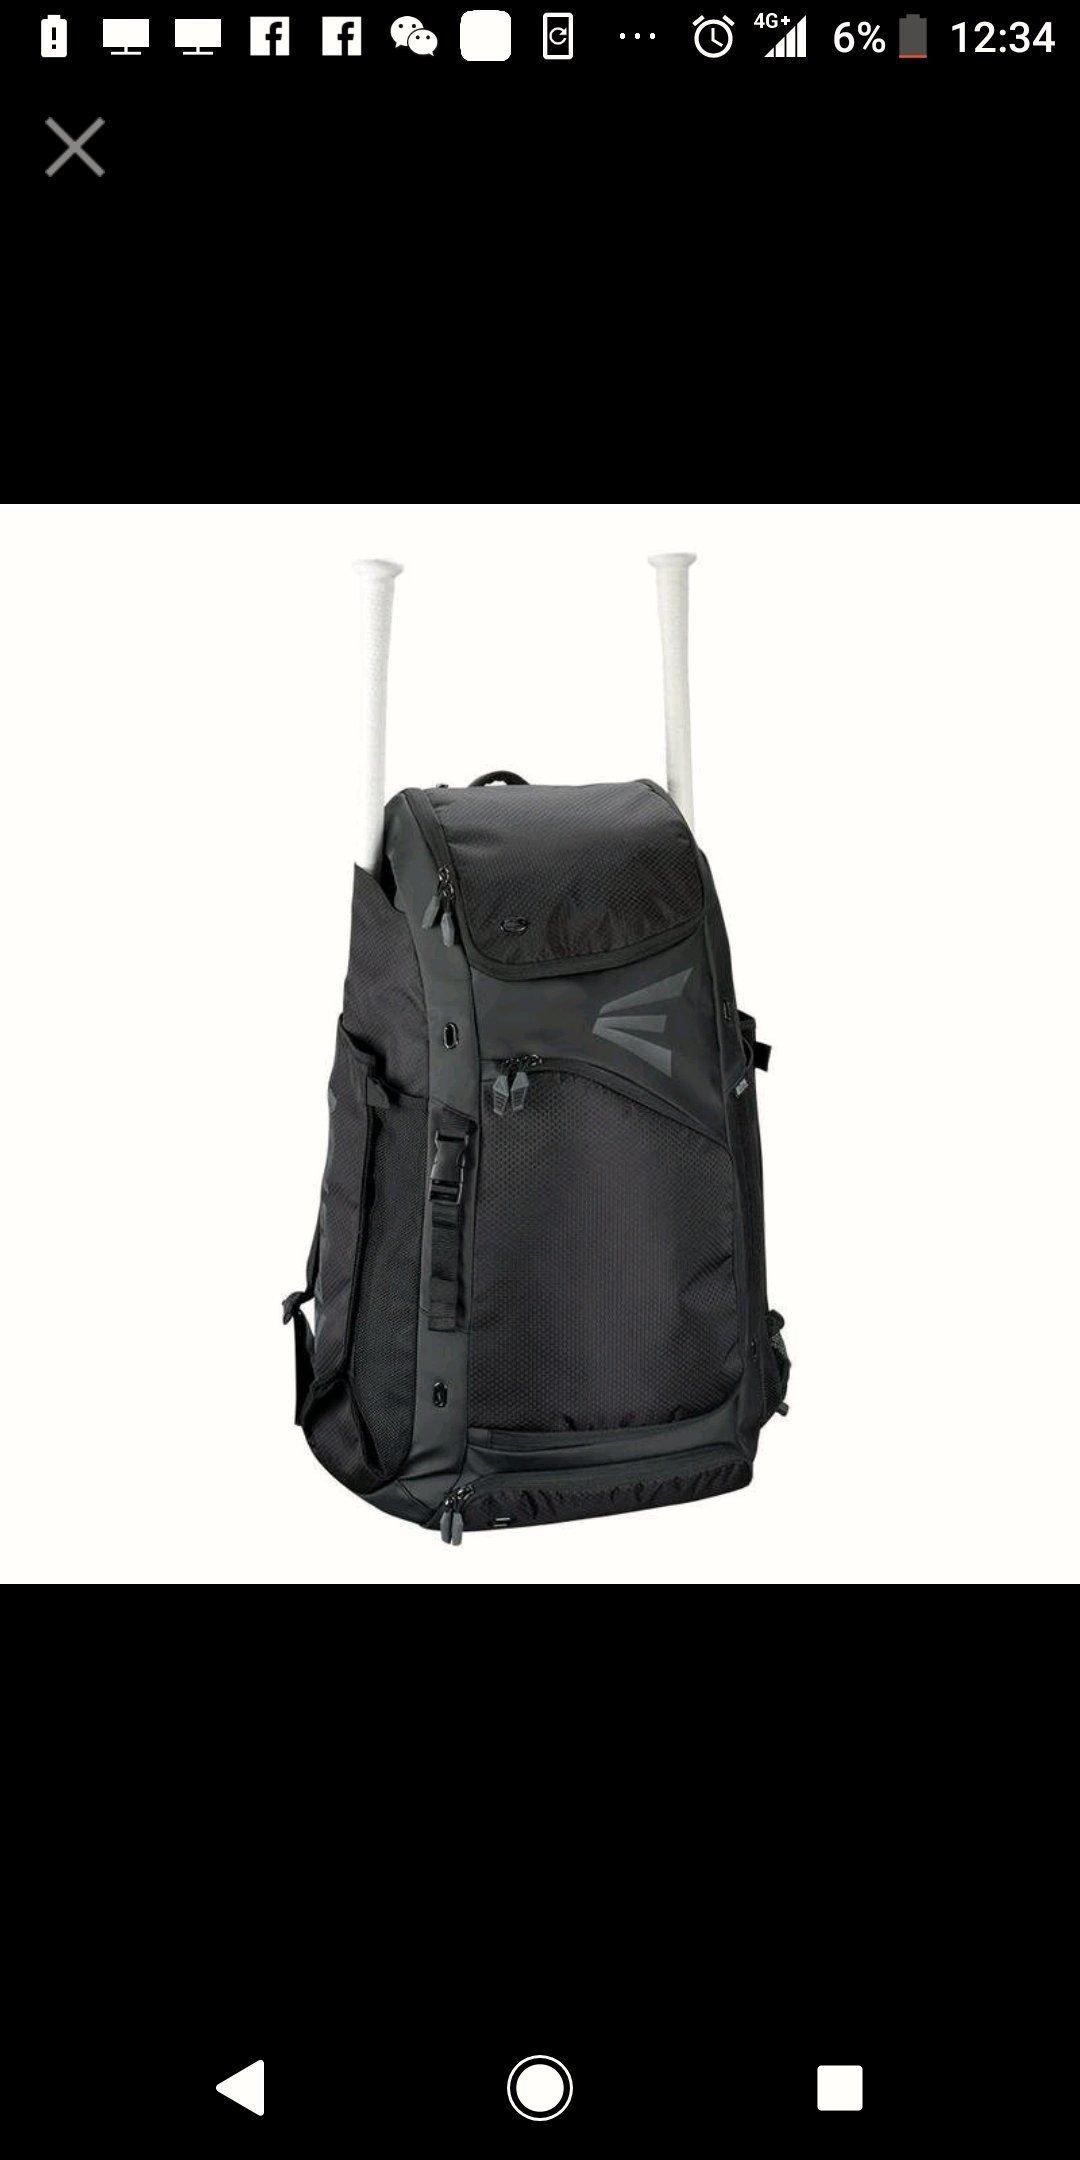 Easton catcher backpack 捕手護具 後背包 近全新